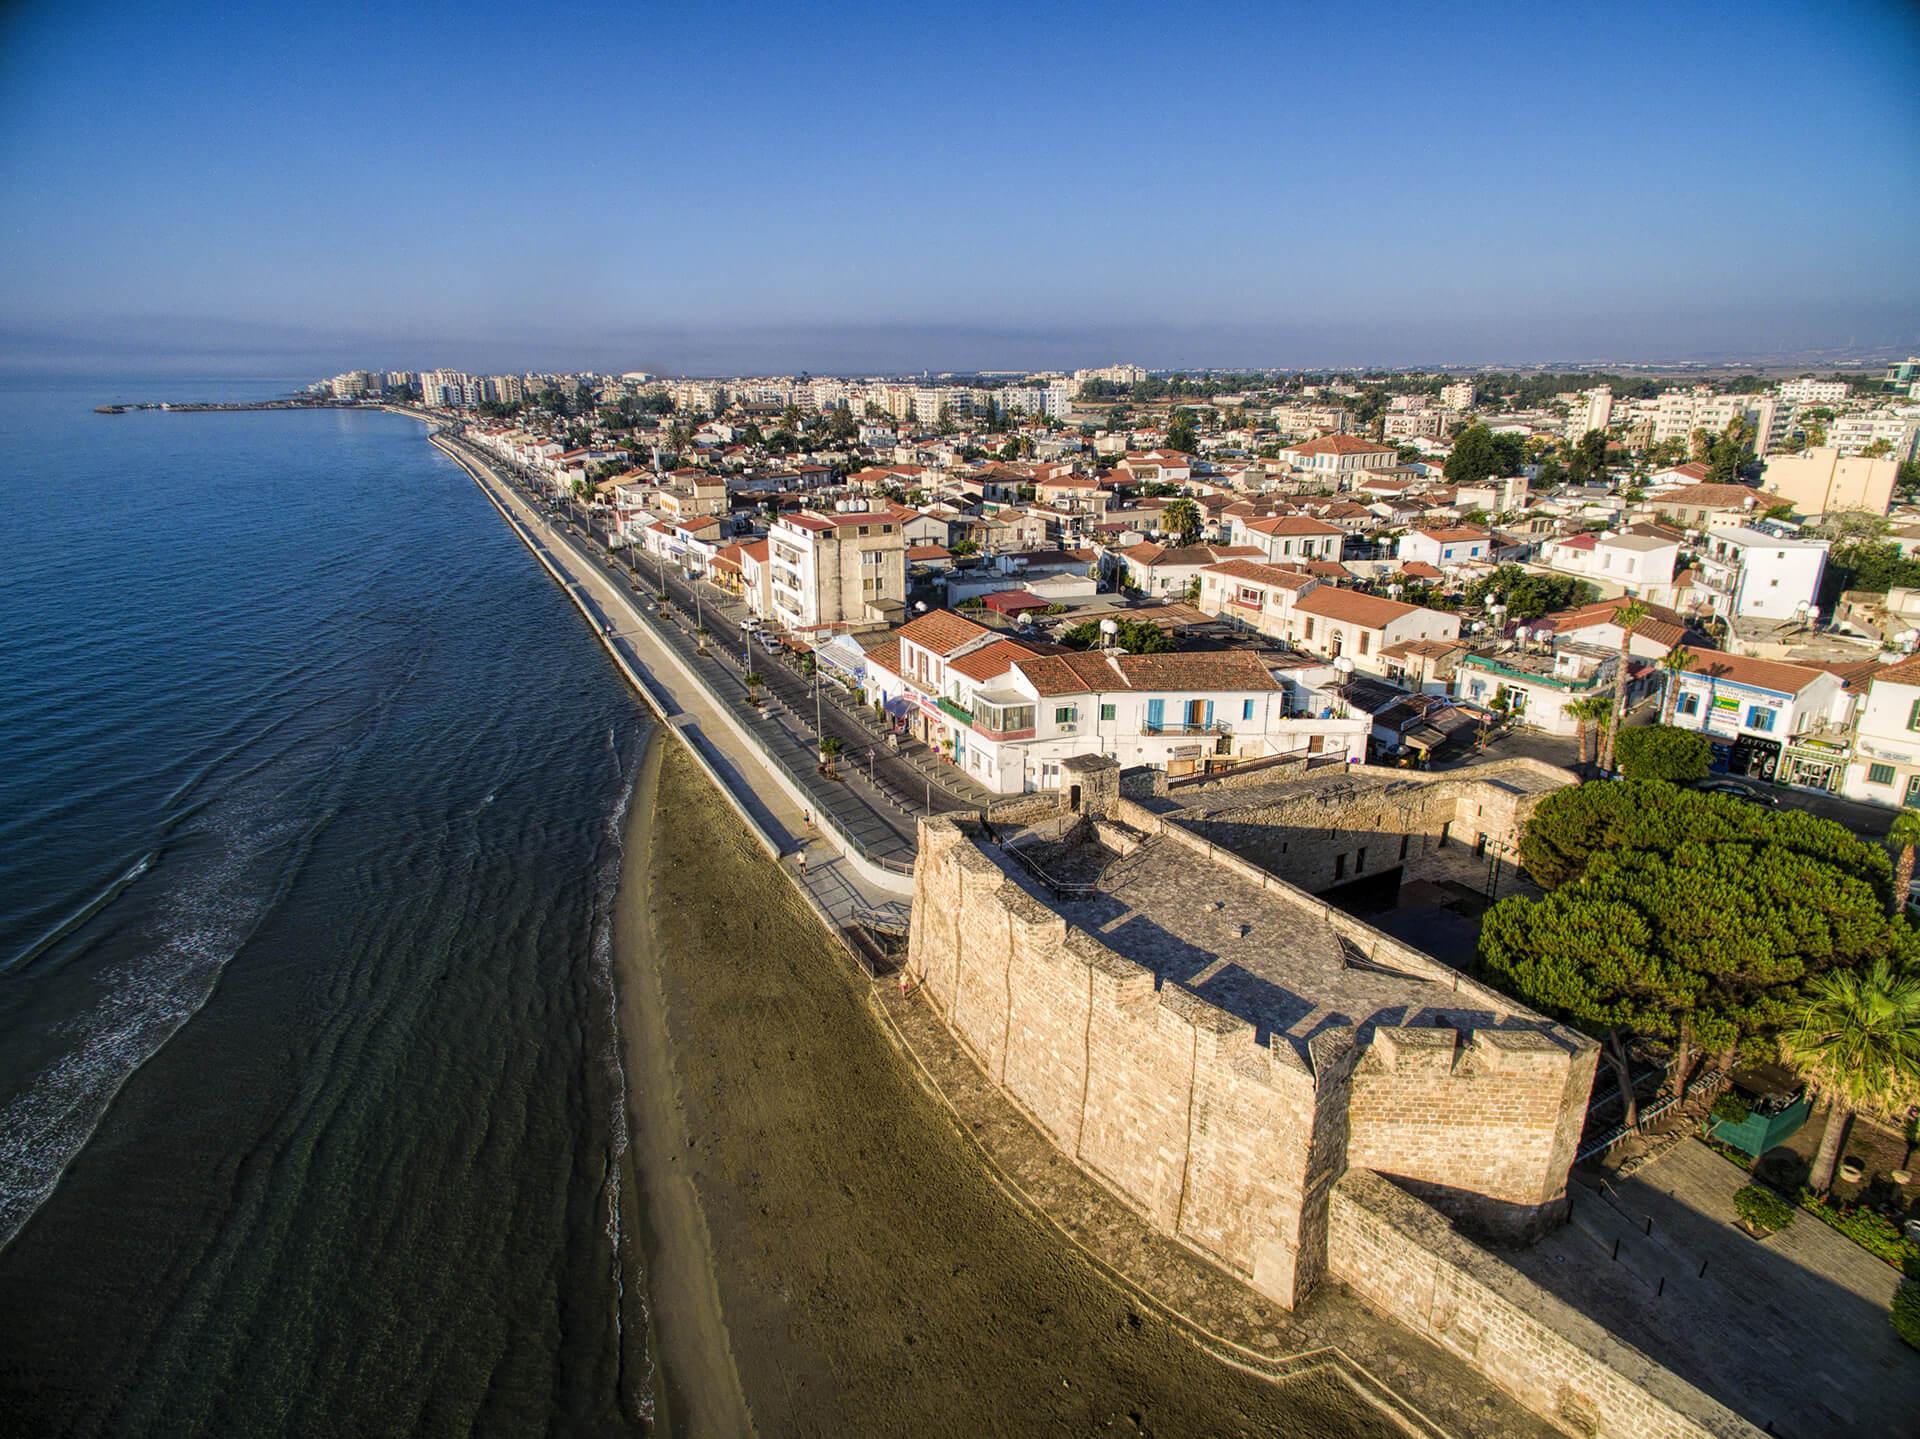 Medieval Castle, Larnaka, Cyprus